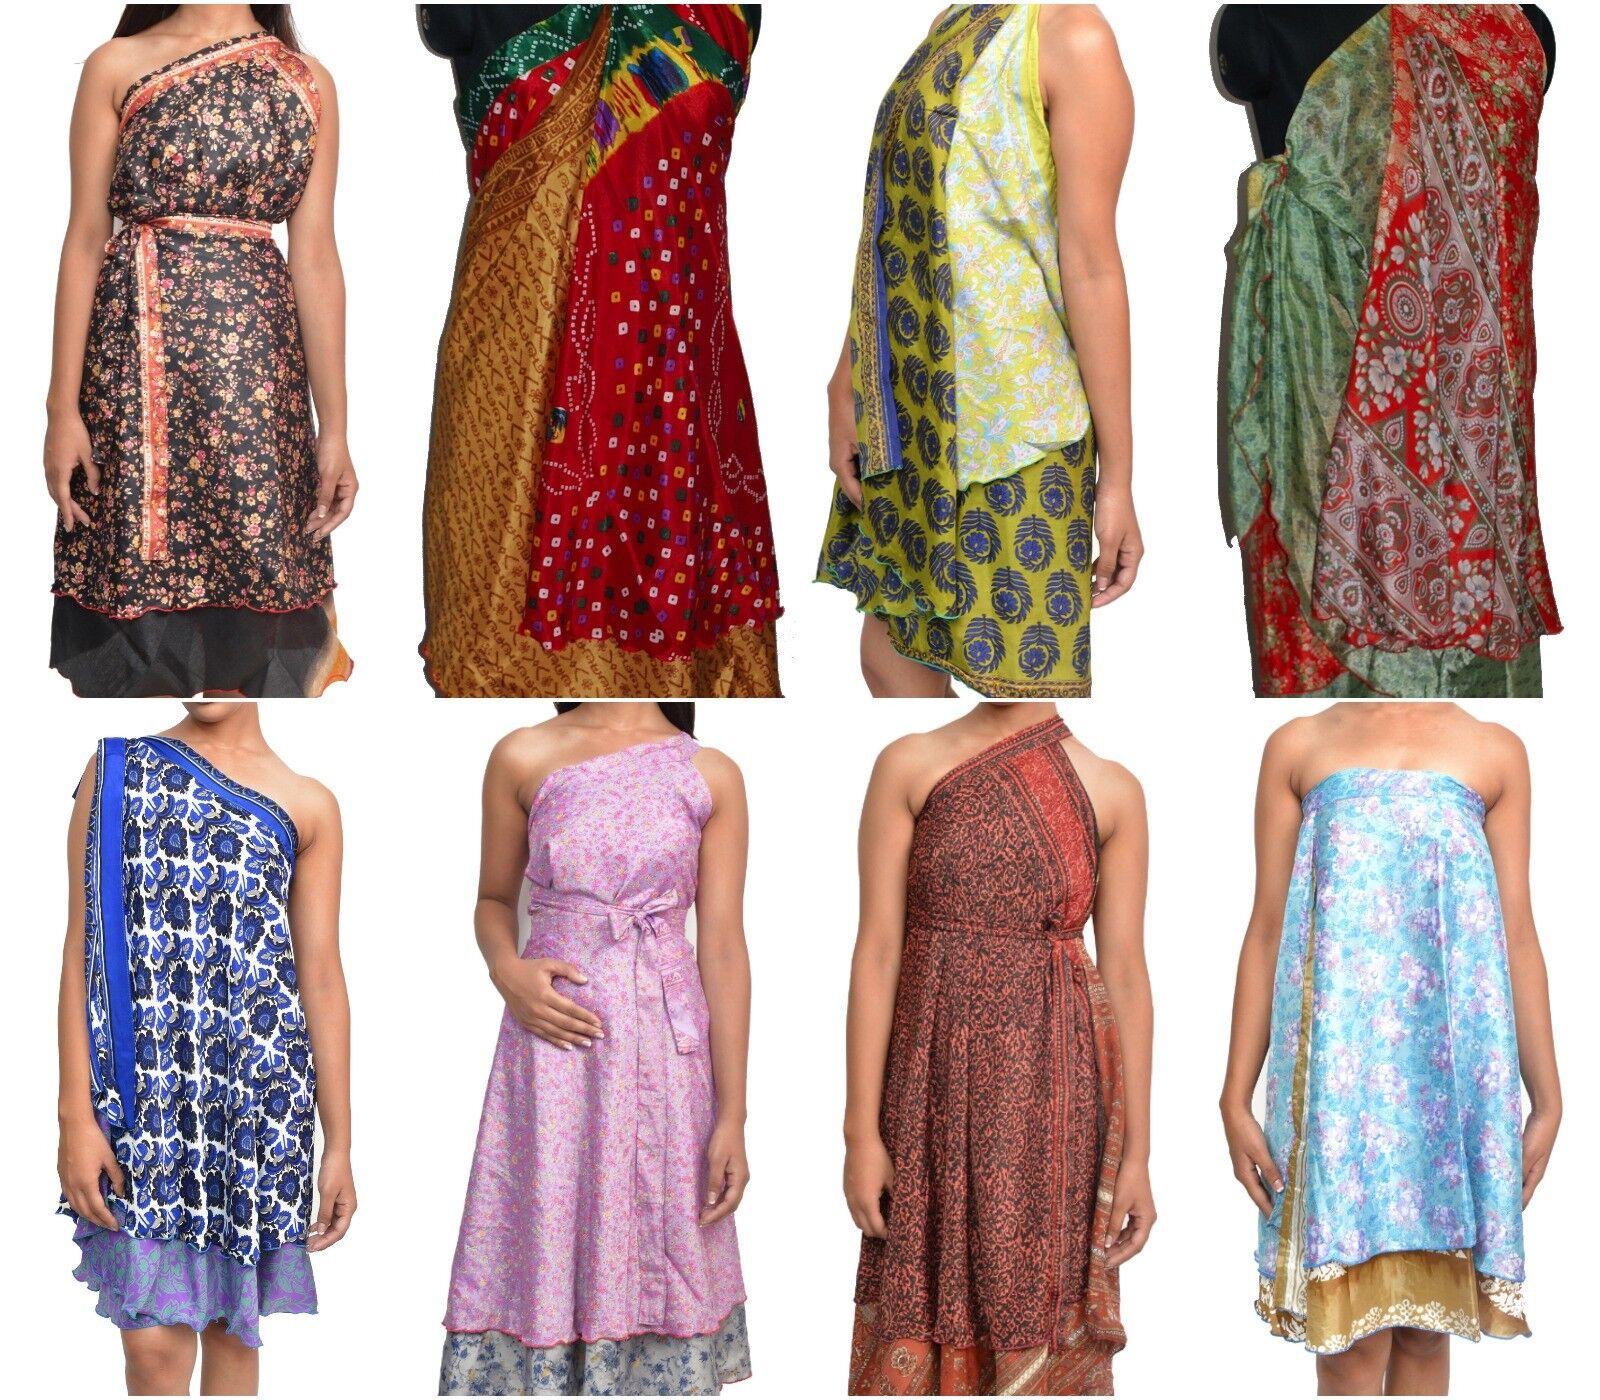 Wholesale 10 Skirts Sari Wrap Sari Sarong Large Reversible Promotion Sale 36